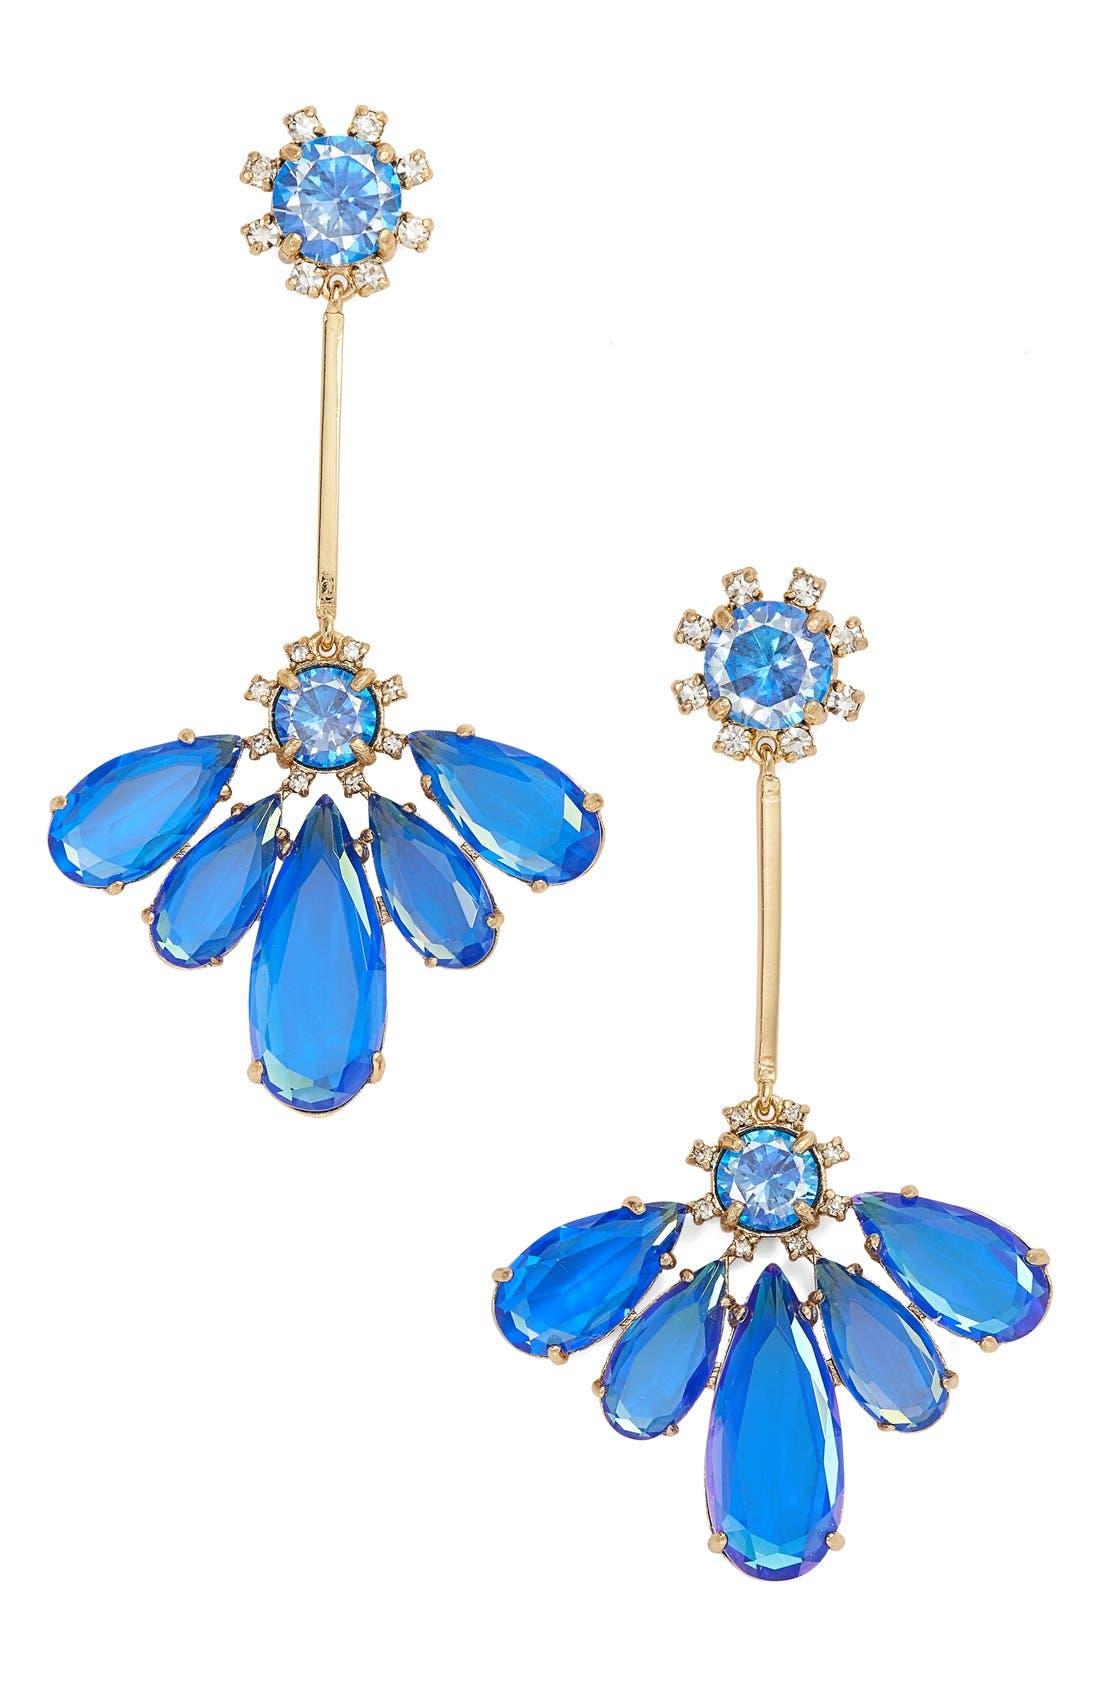 Alternate Image 1 Selected - kate spade new york 'color crush' drop earrings